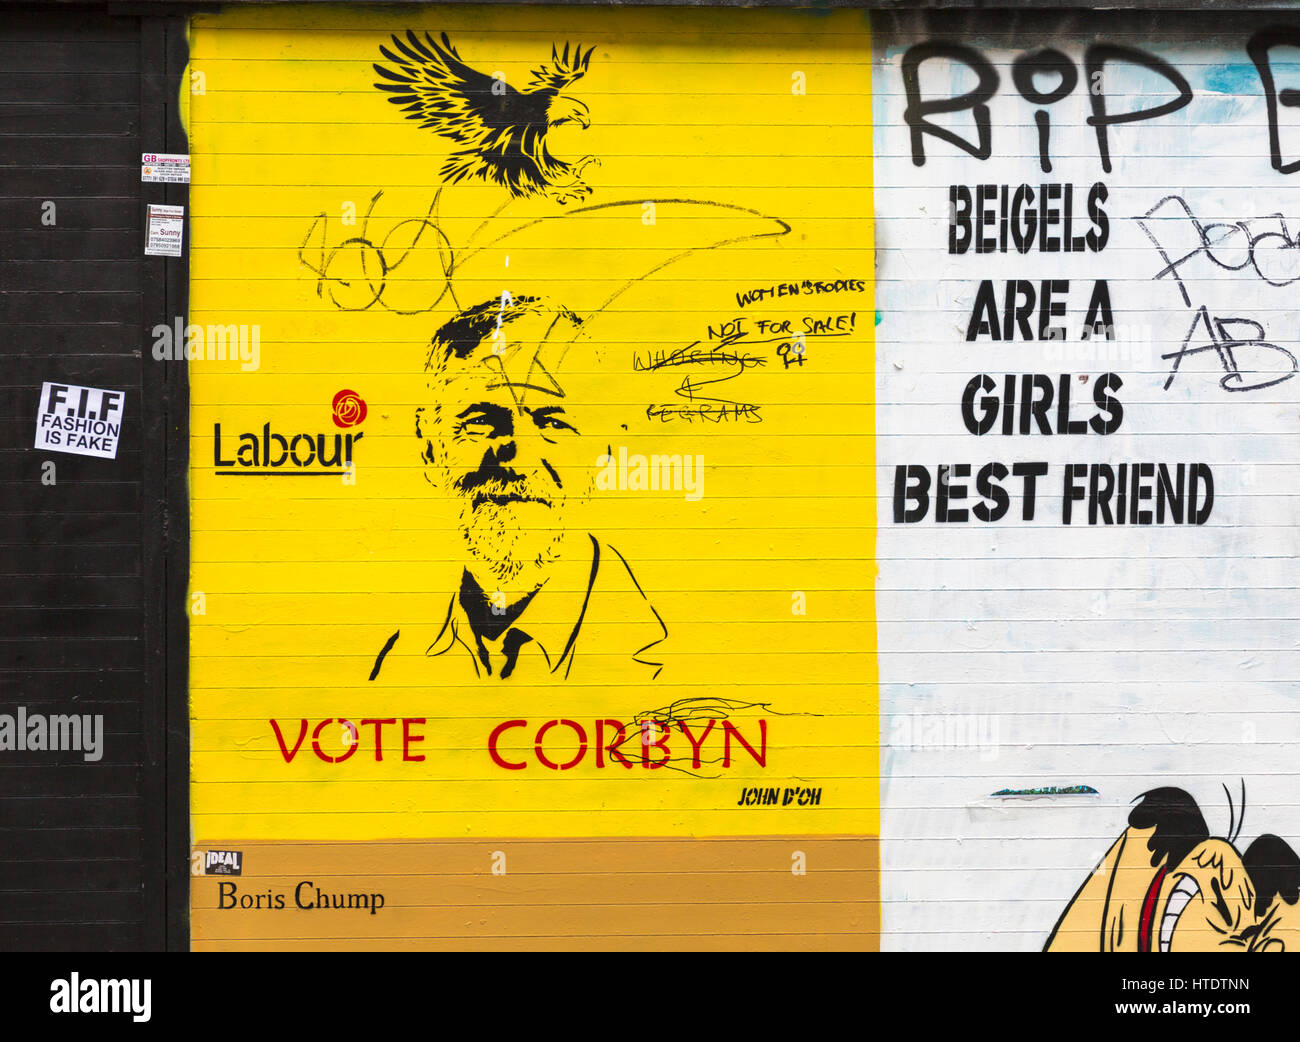 Vote Corbyn, Boris Chump and beigels are a girls best friend, womens ...